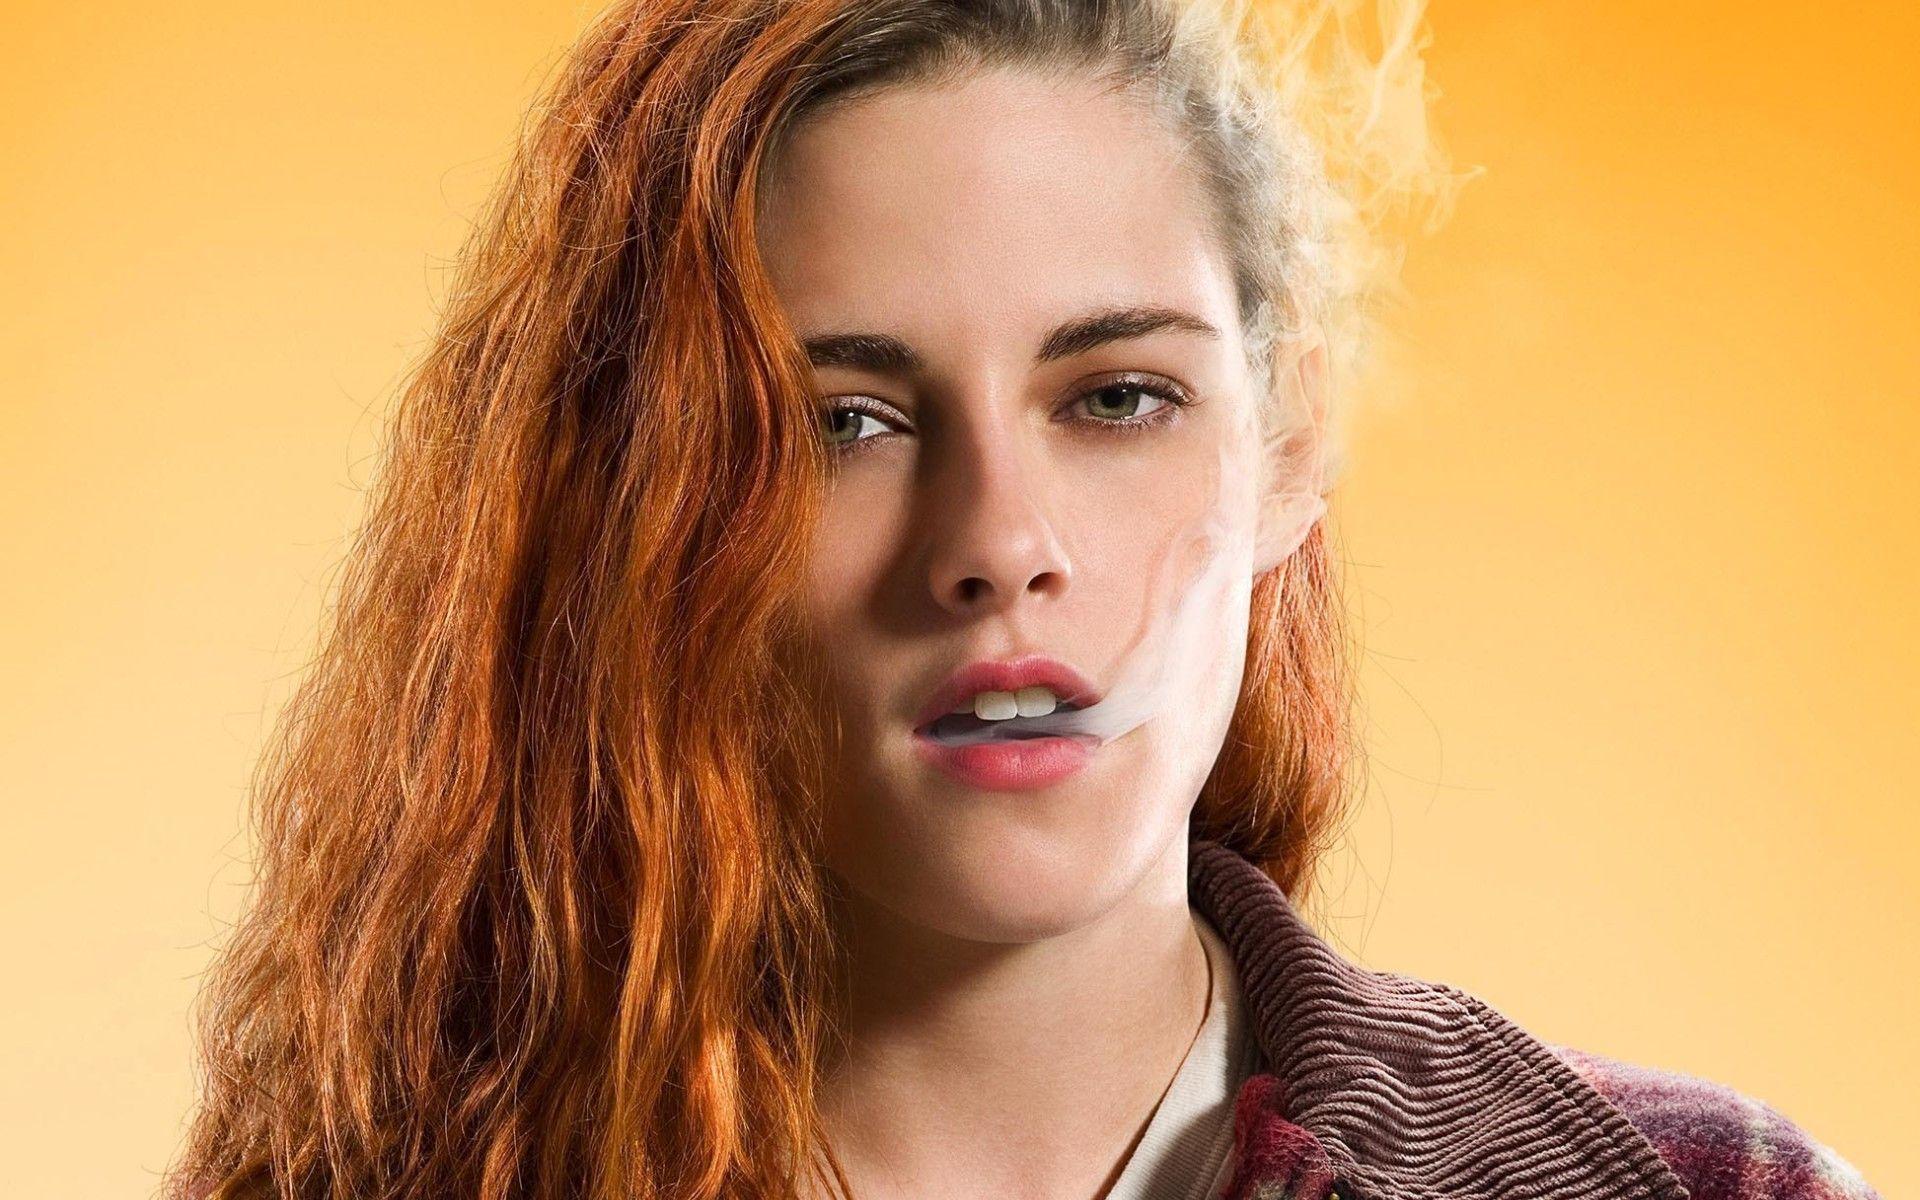 Who smoke stars cigarettes hollywood 22 Celebs